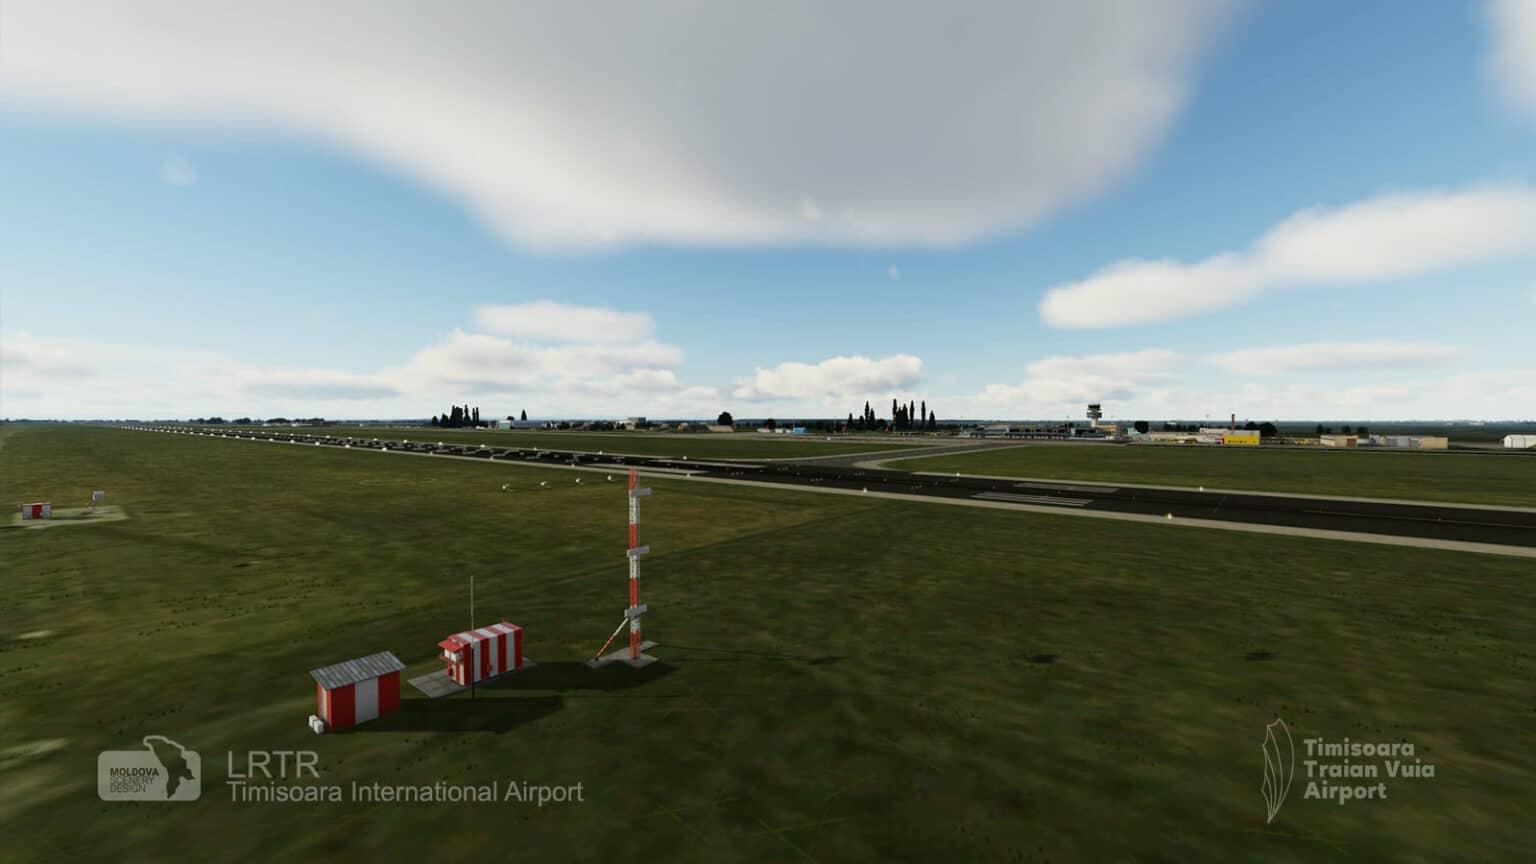 MSD_Timisoara_Airport (2)